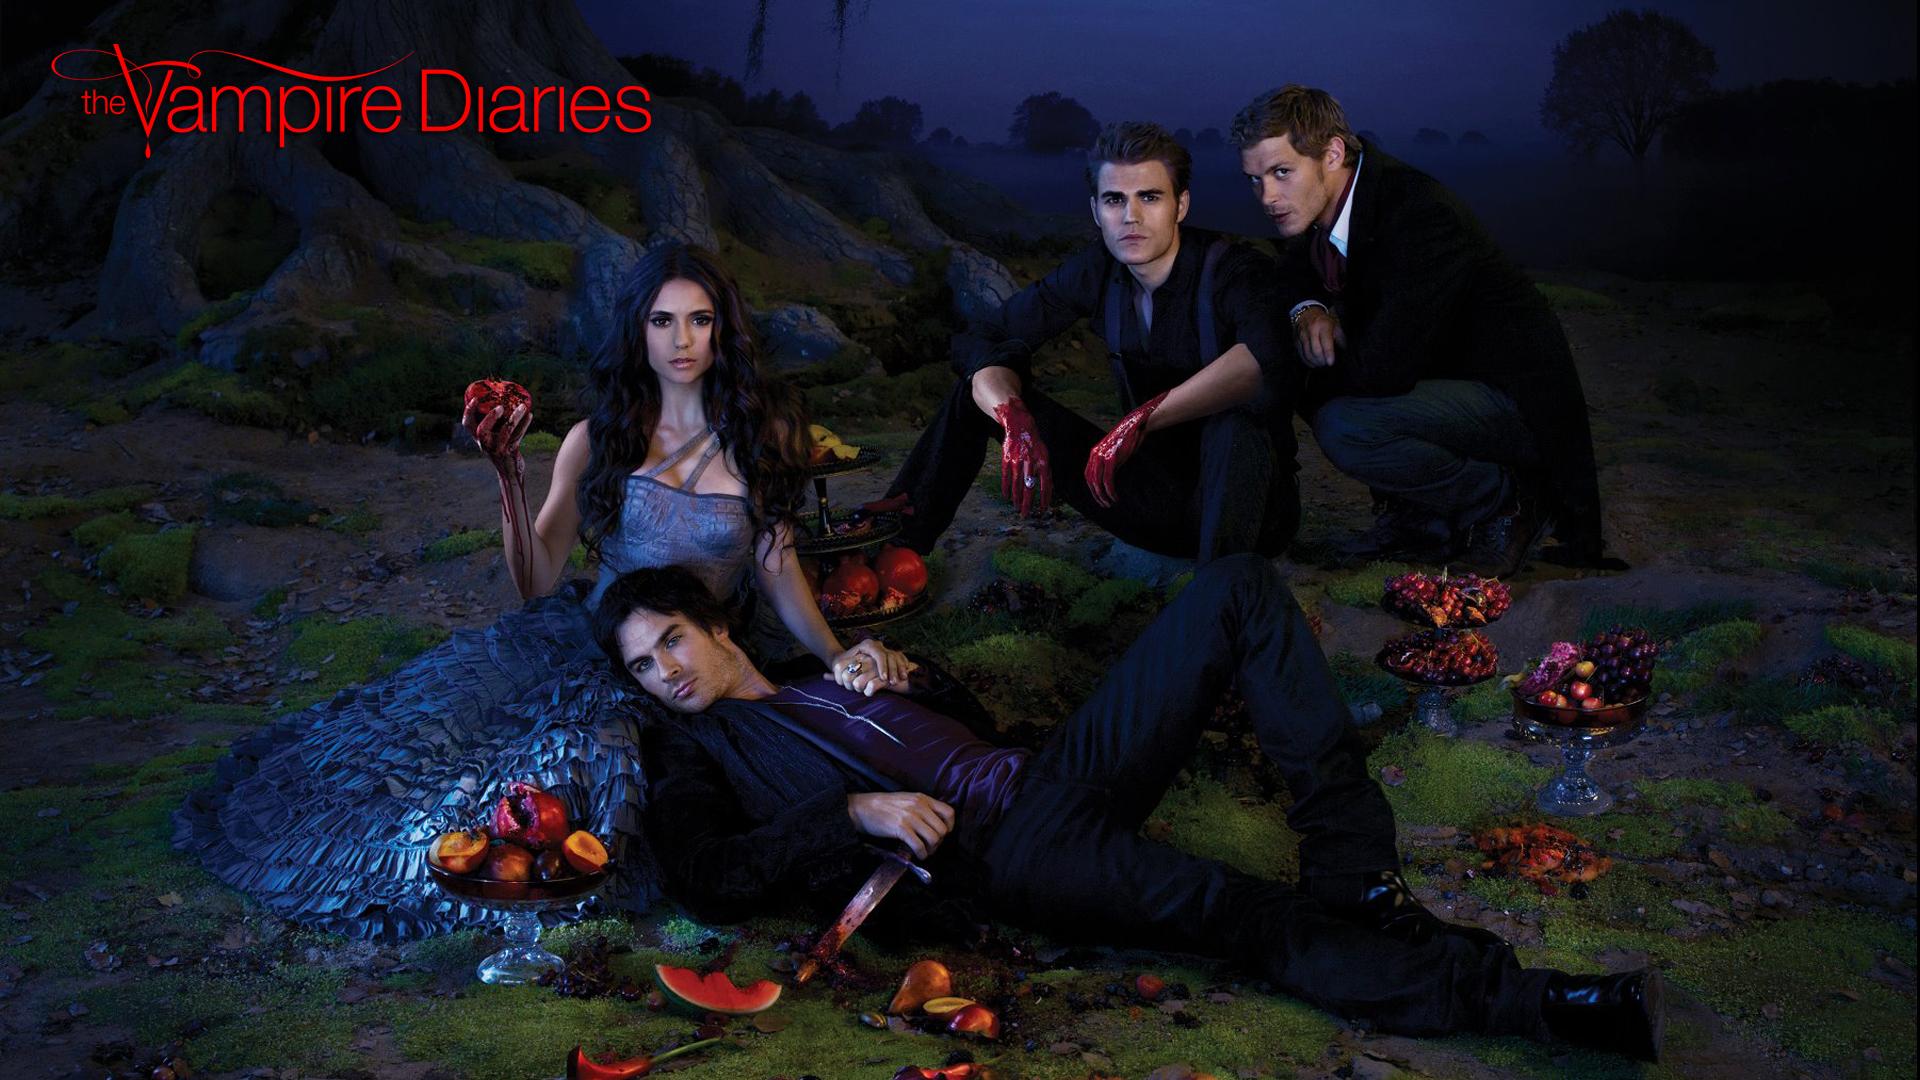 Vampire Diaries Wallpaper Gossip Girl The Vampire Diaries TVD